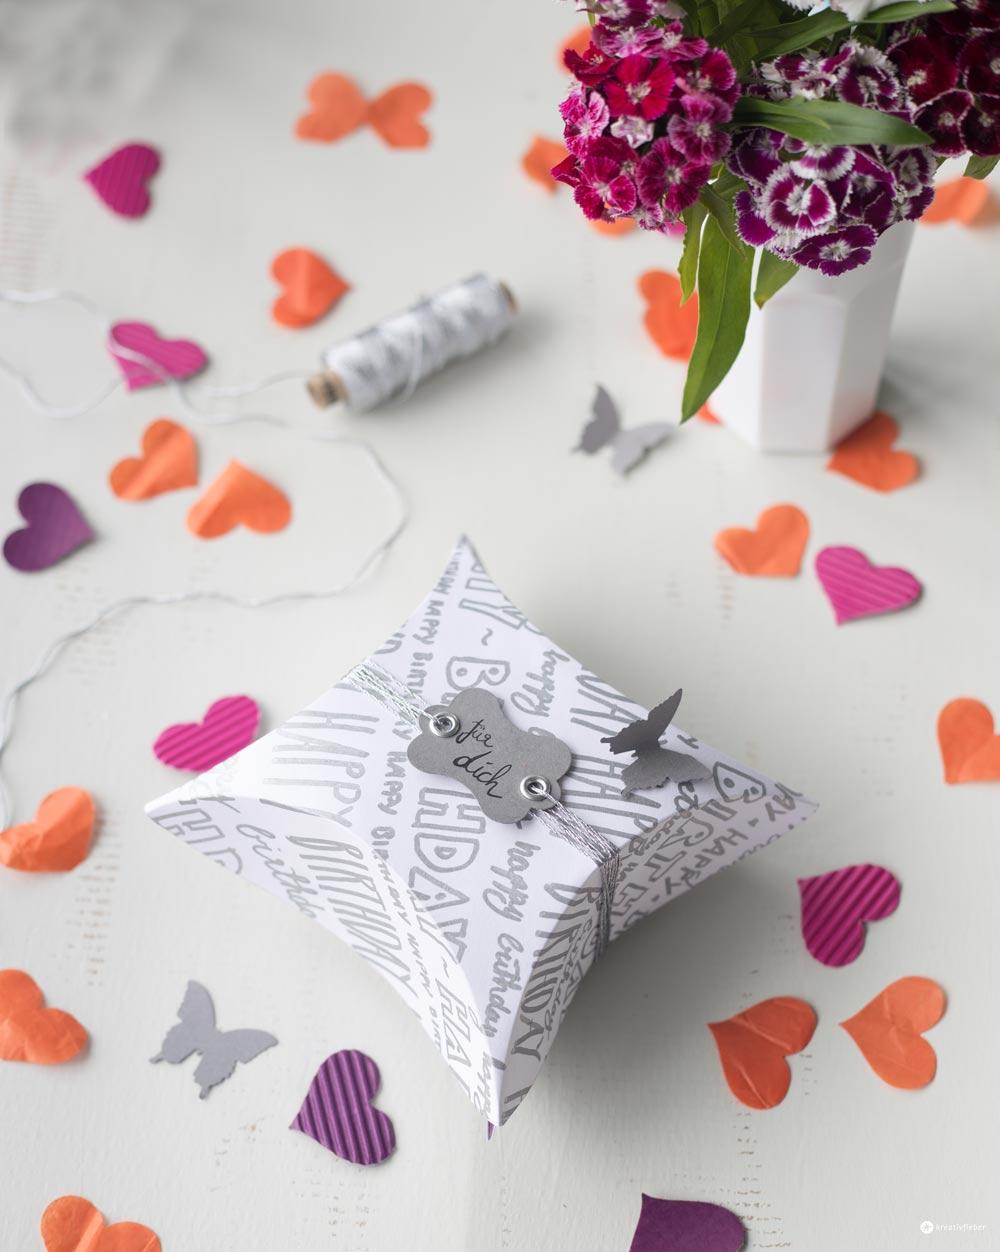 DIY Geschenkidee - Geschenkschachtel mit Handlettering falten - Schritt für Schritt Anleitung auf Kreativfieber